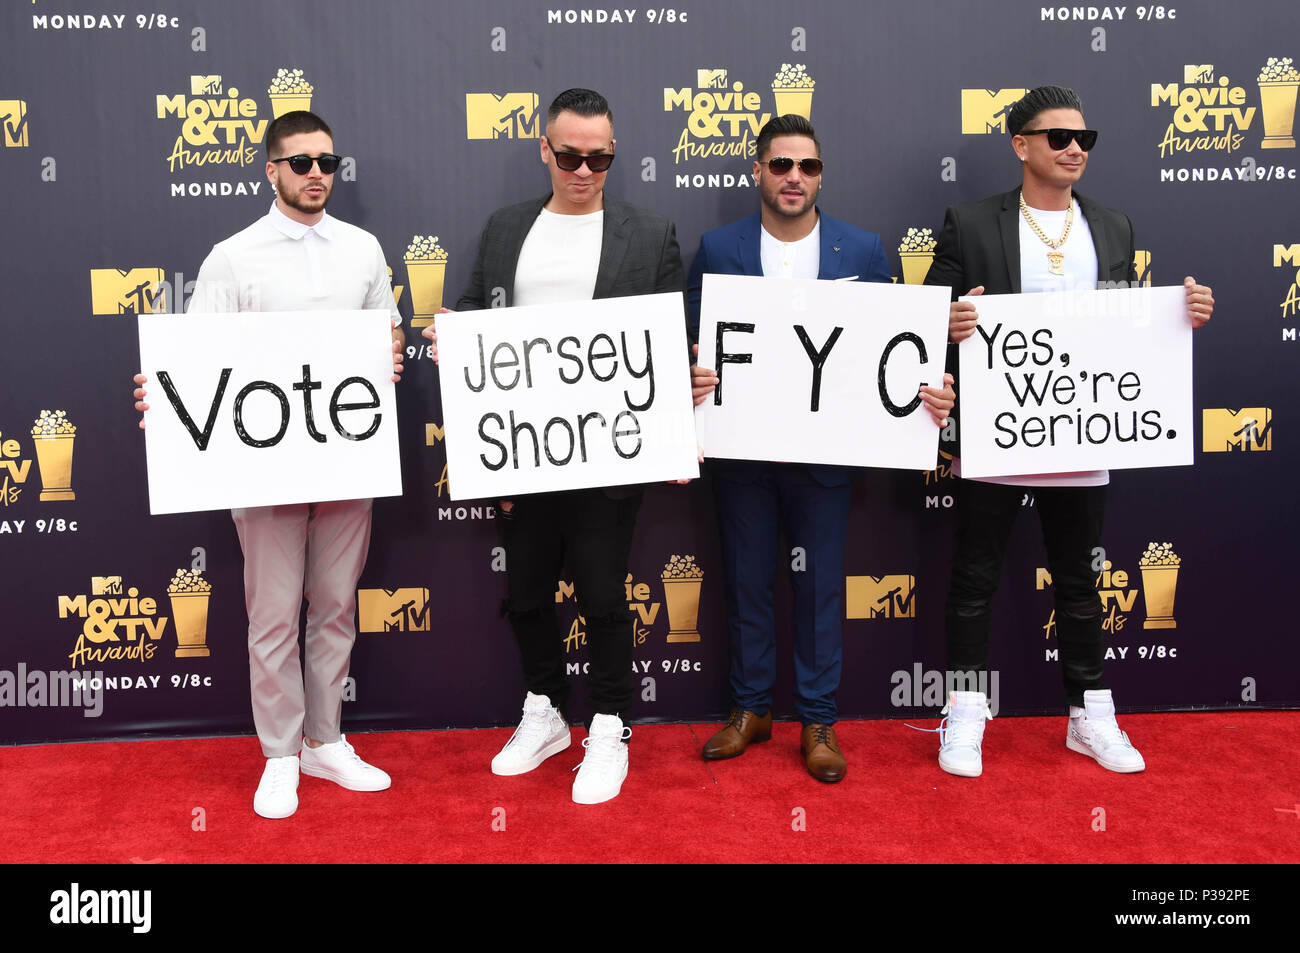 Jersey Shore Cast Stock Photos & Jersey Shore Cast Stock